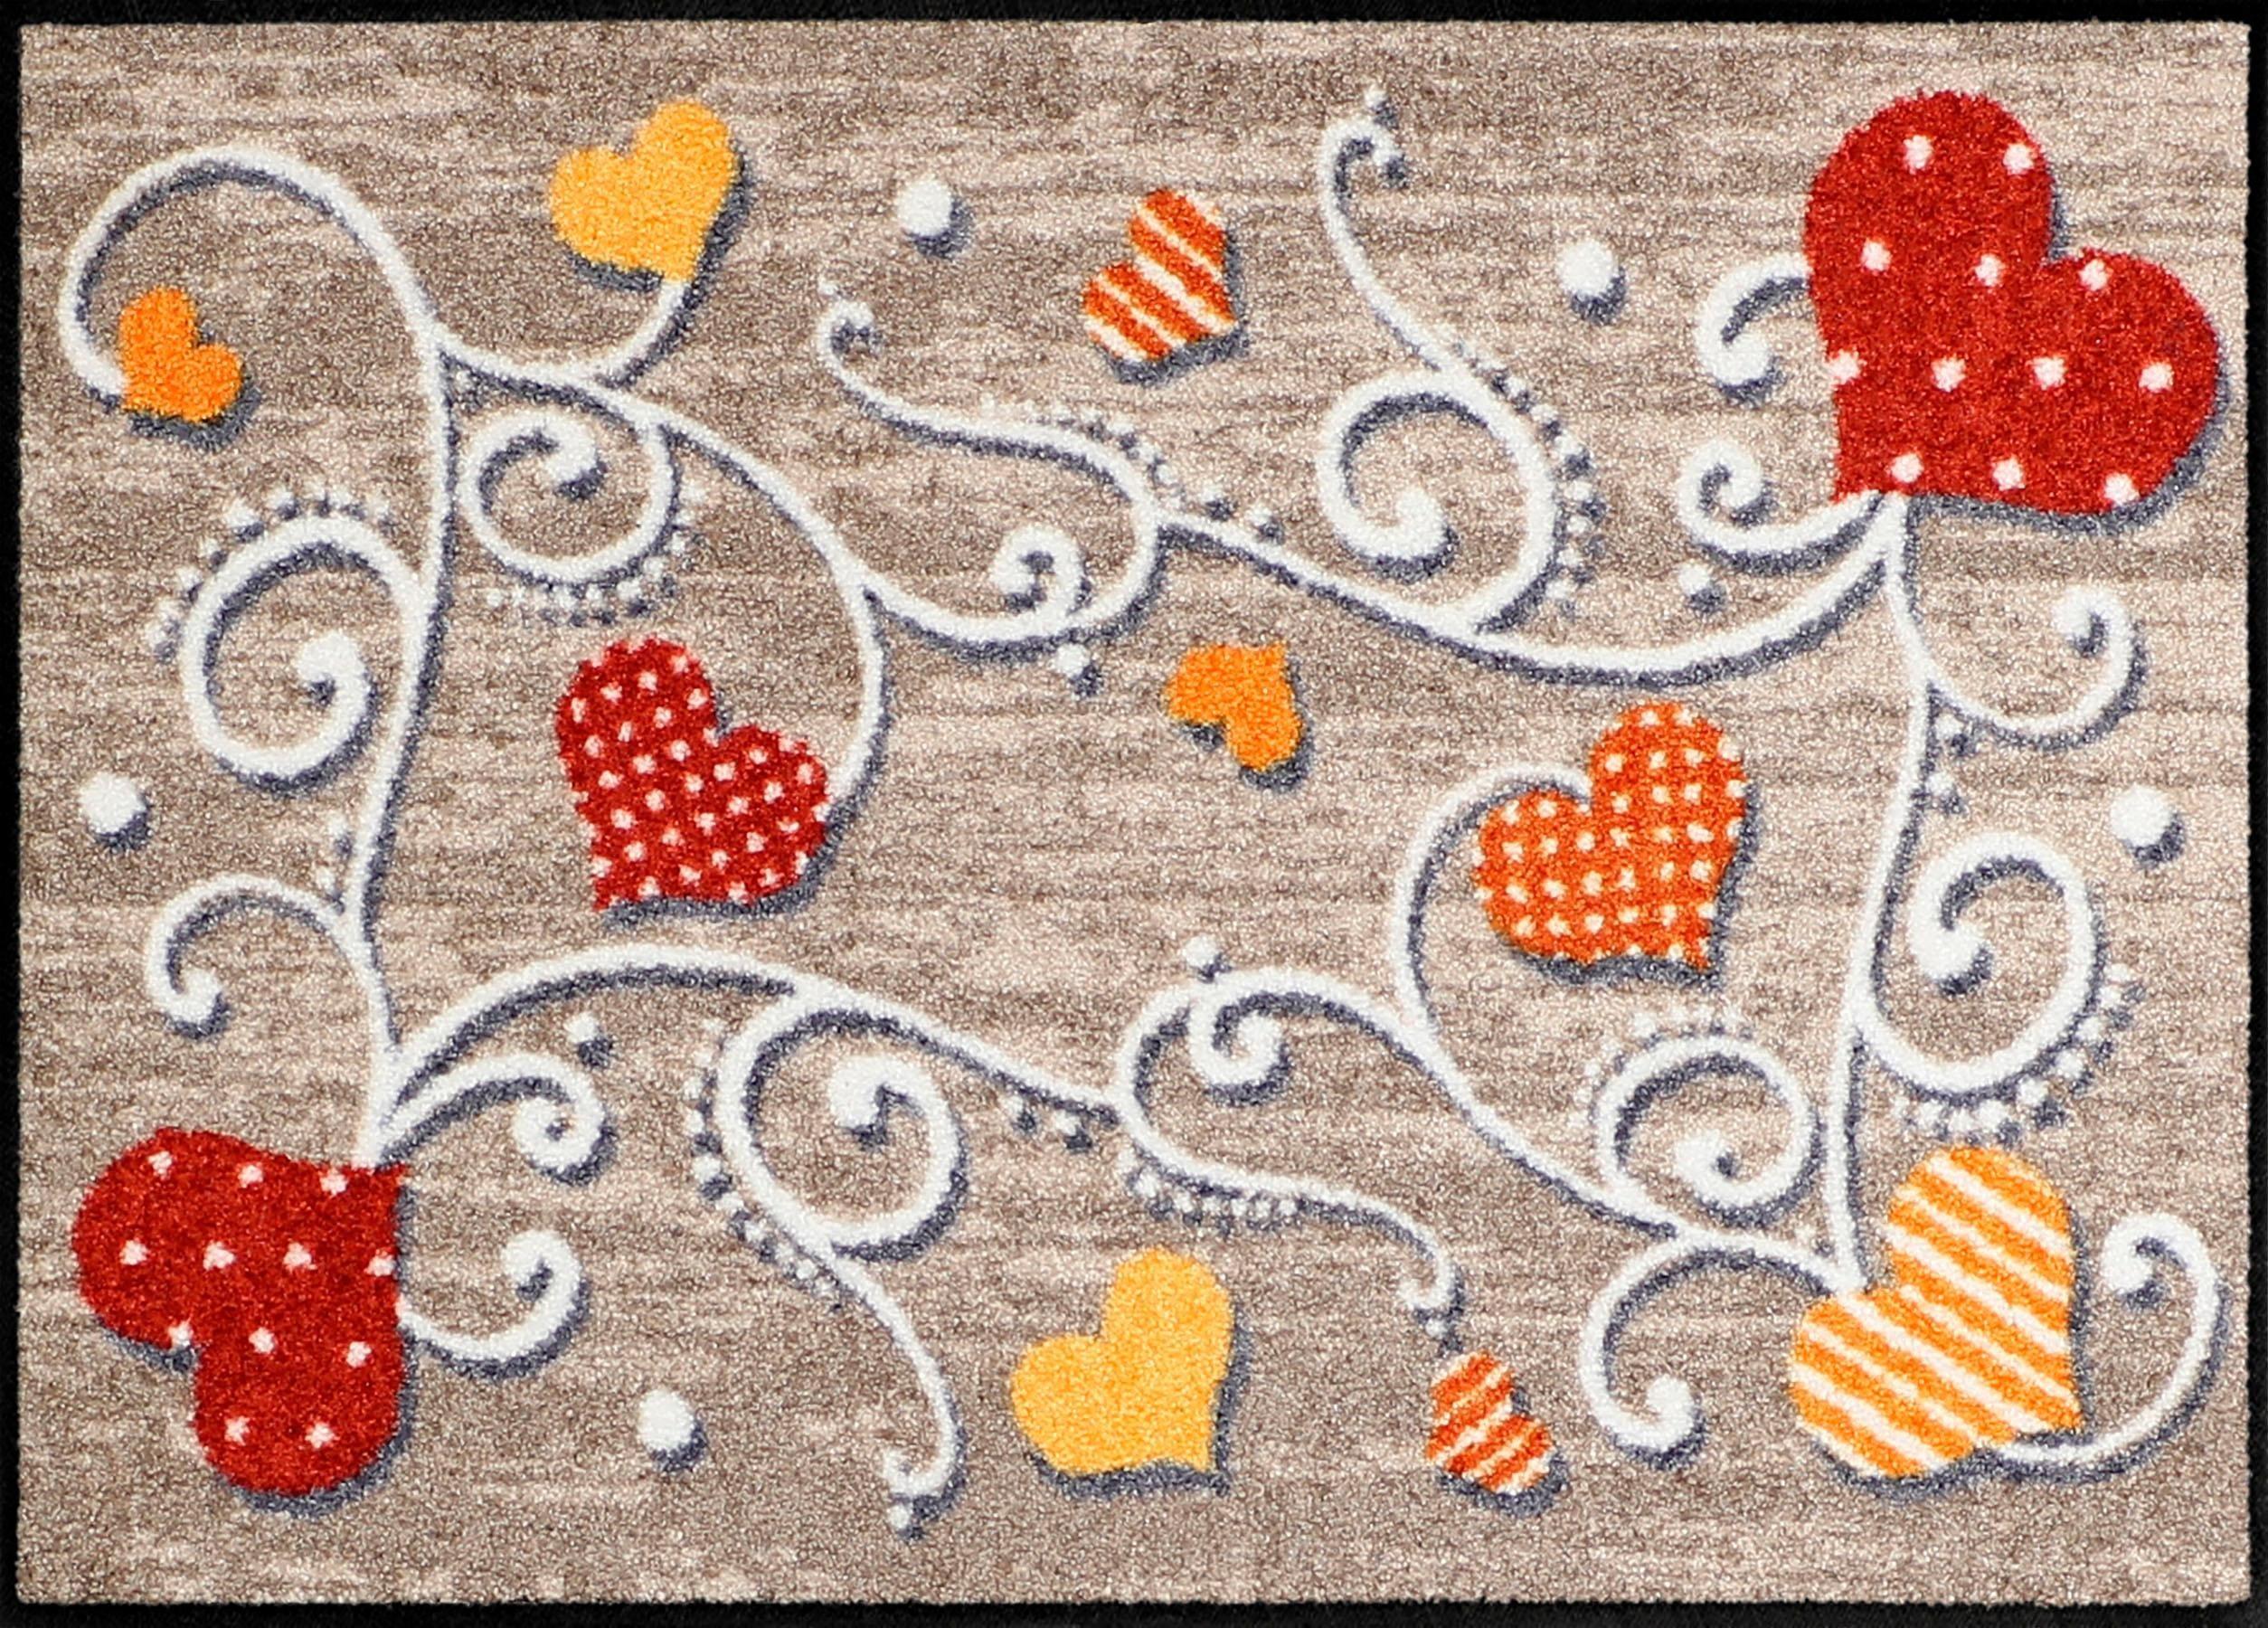 Fußmatte »Herzgarten«, Salonloewe, rechteckig, Höhe 6 mm | Heimtextilien > Fussmatten | Salonloewe